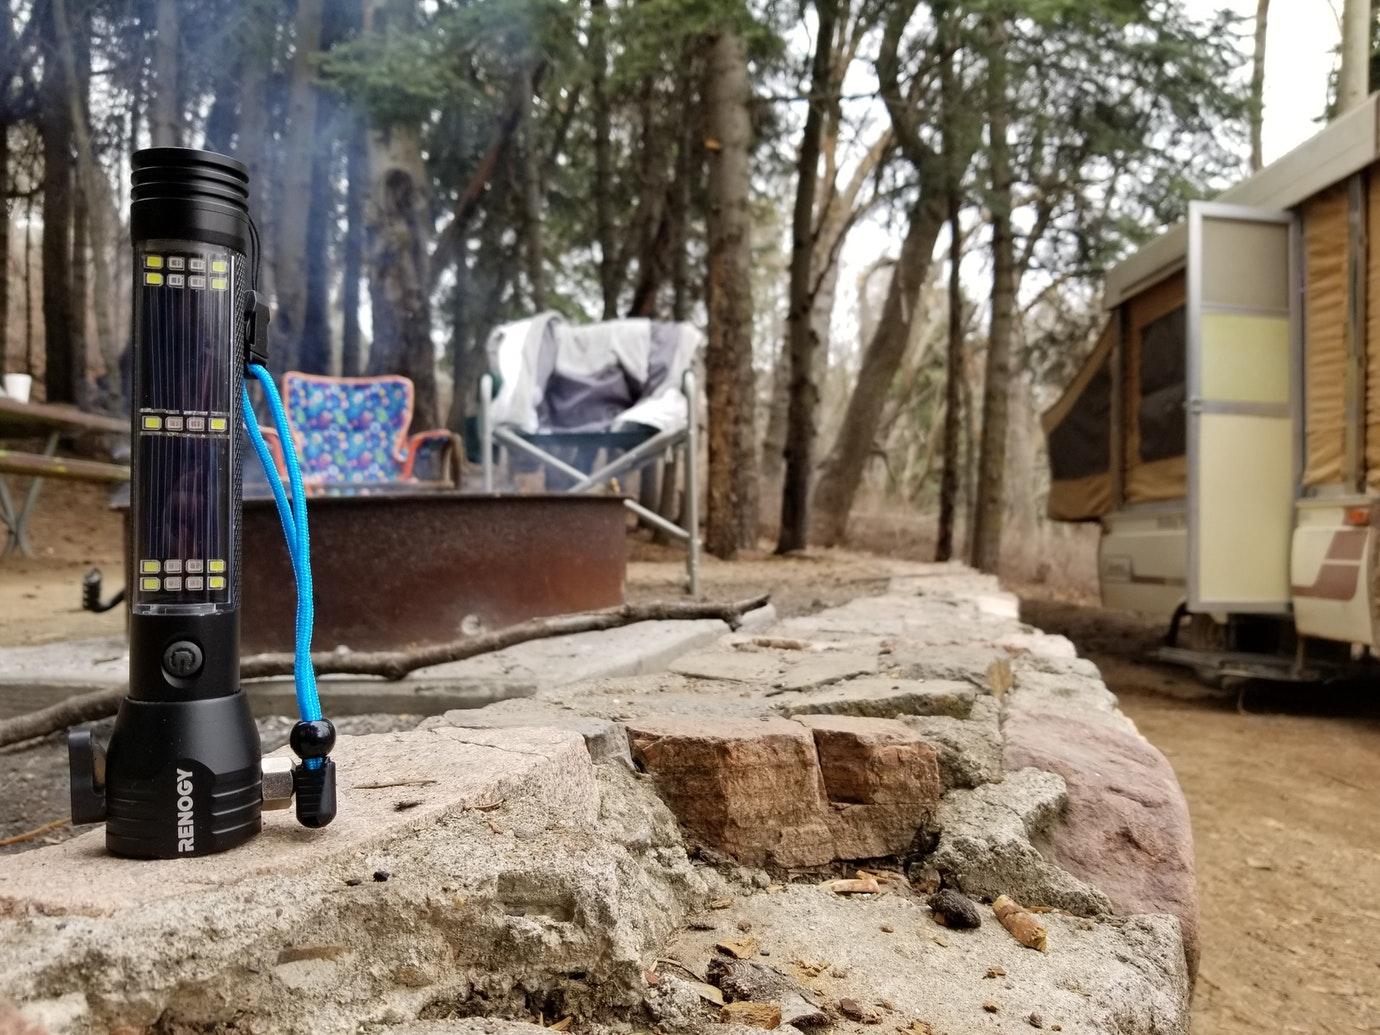 camping solar panels flashlight